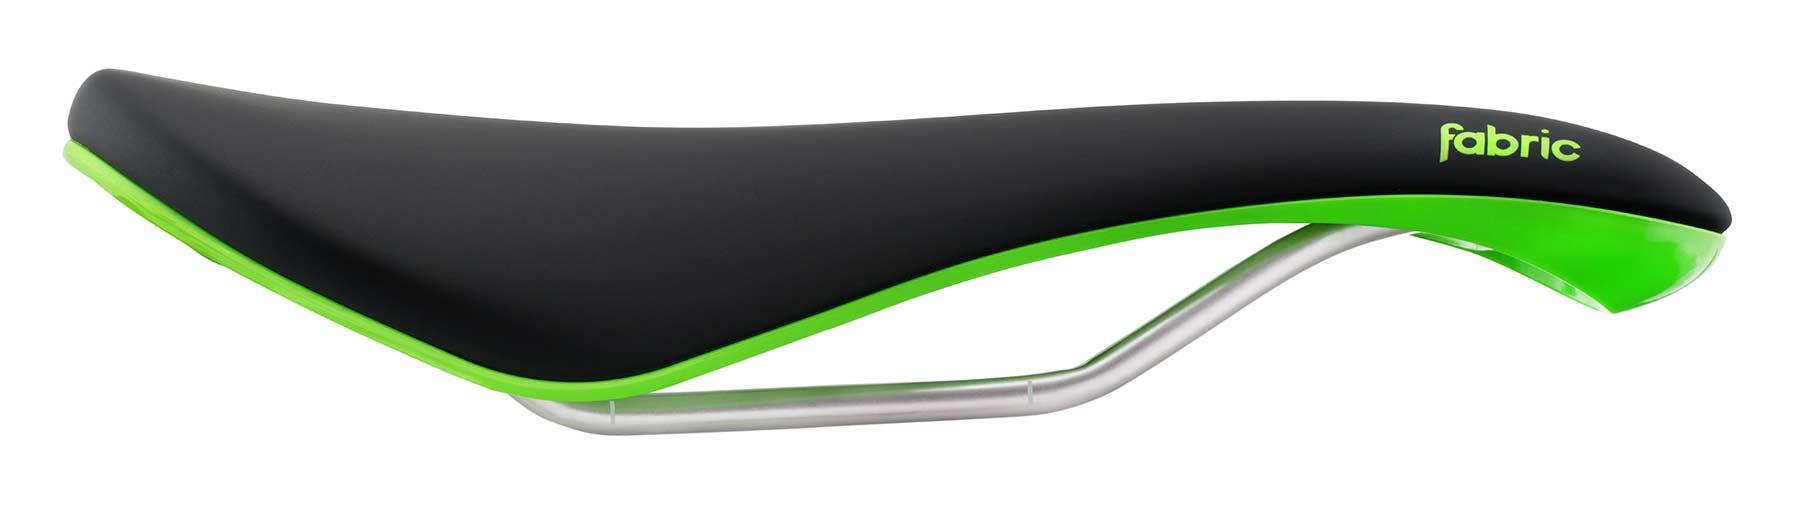 Fabric Scoop Radius Elite sadel sort/grøn | Sadler